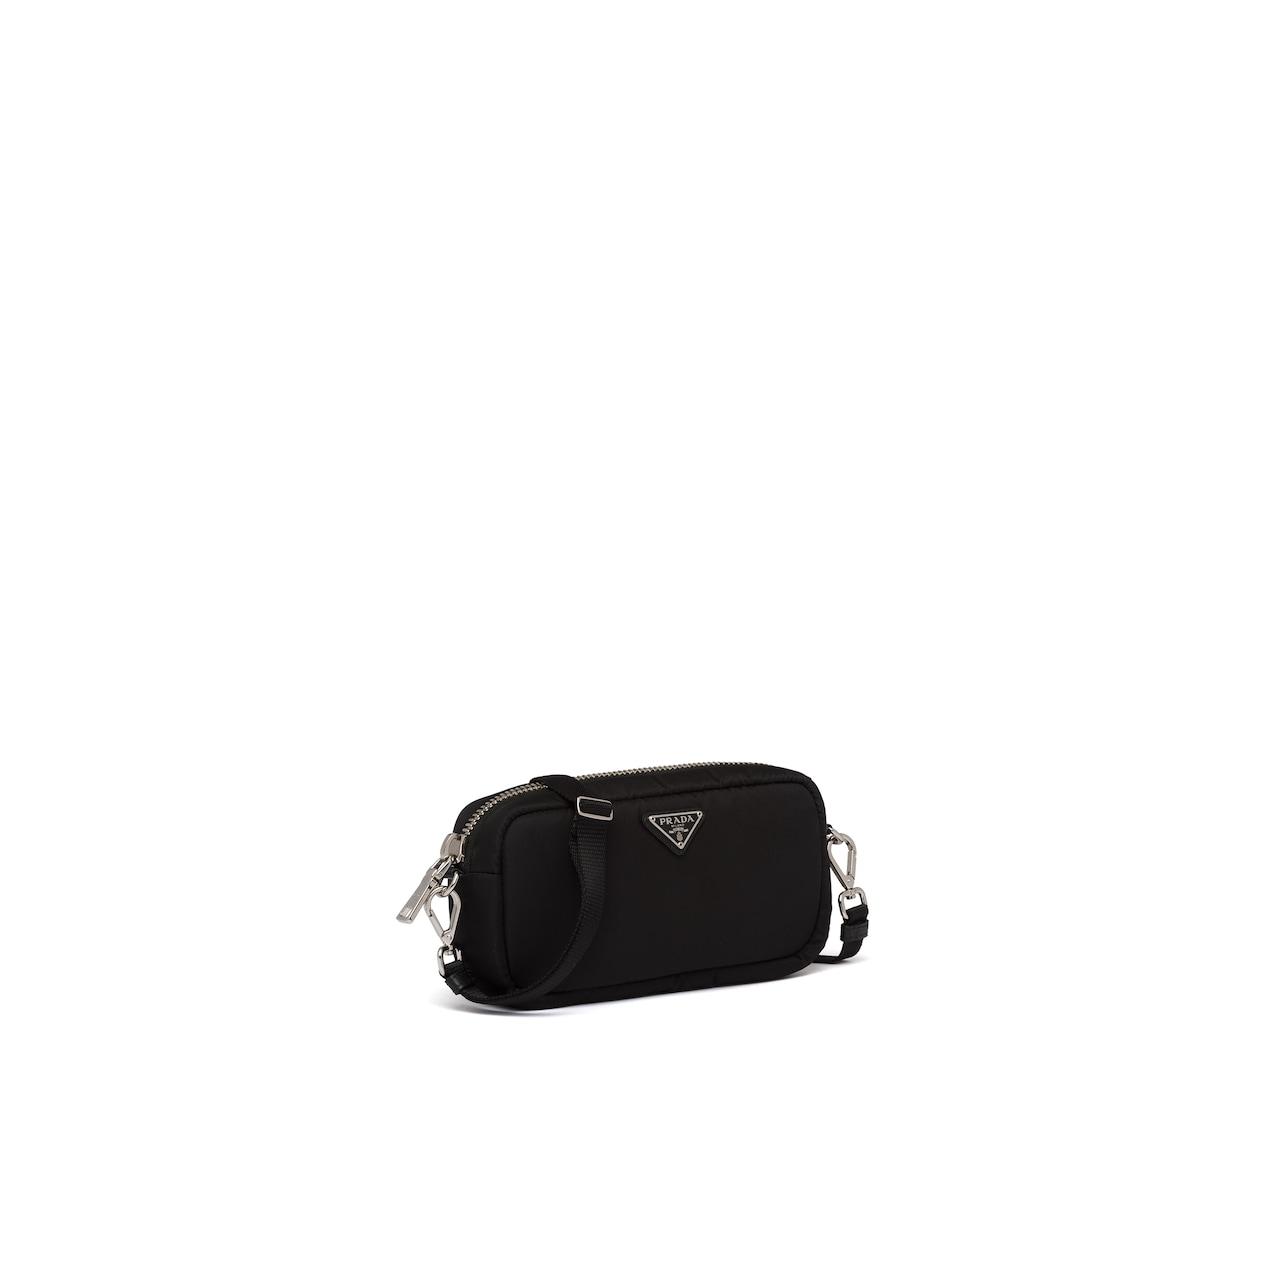 Prada Prada Nylon Cargo mini-bag 6